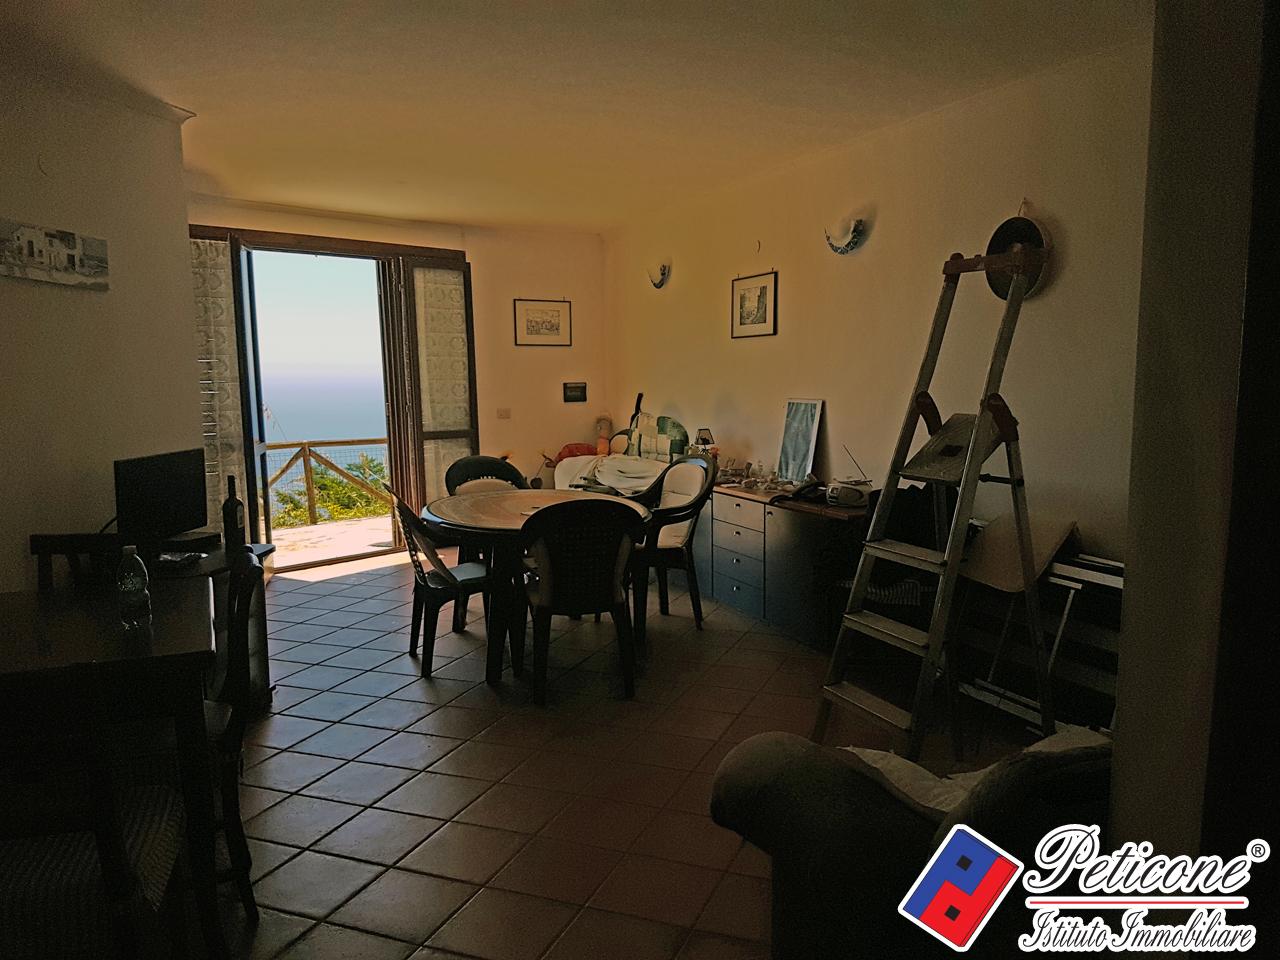 Villa in Vendita a Sperlonga: 4 locali, 90 mq - Foto 7